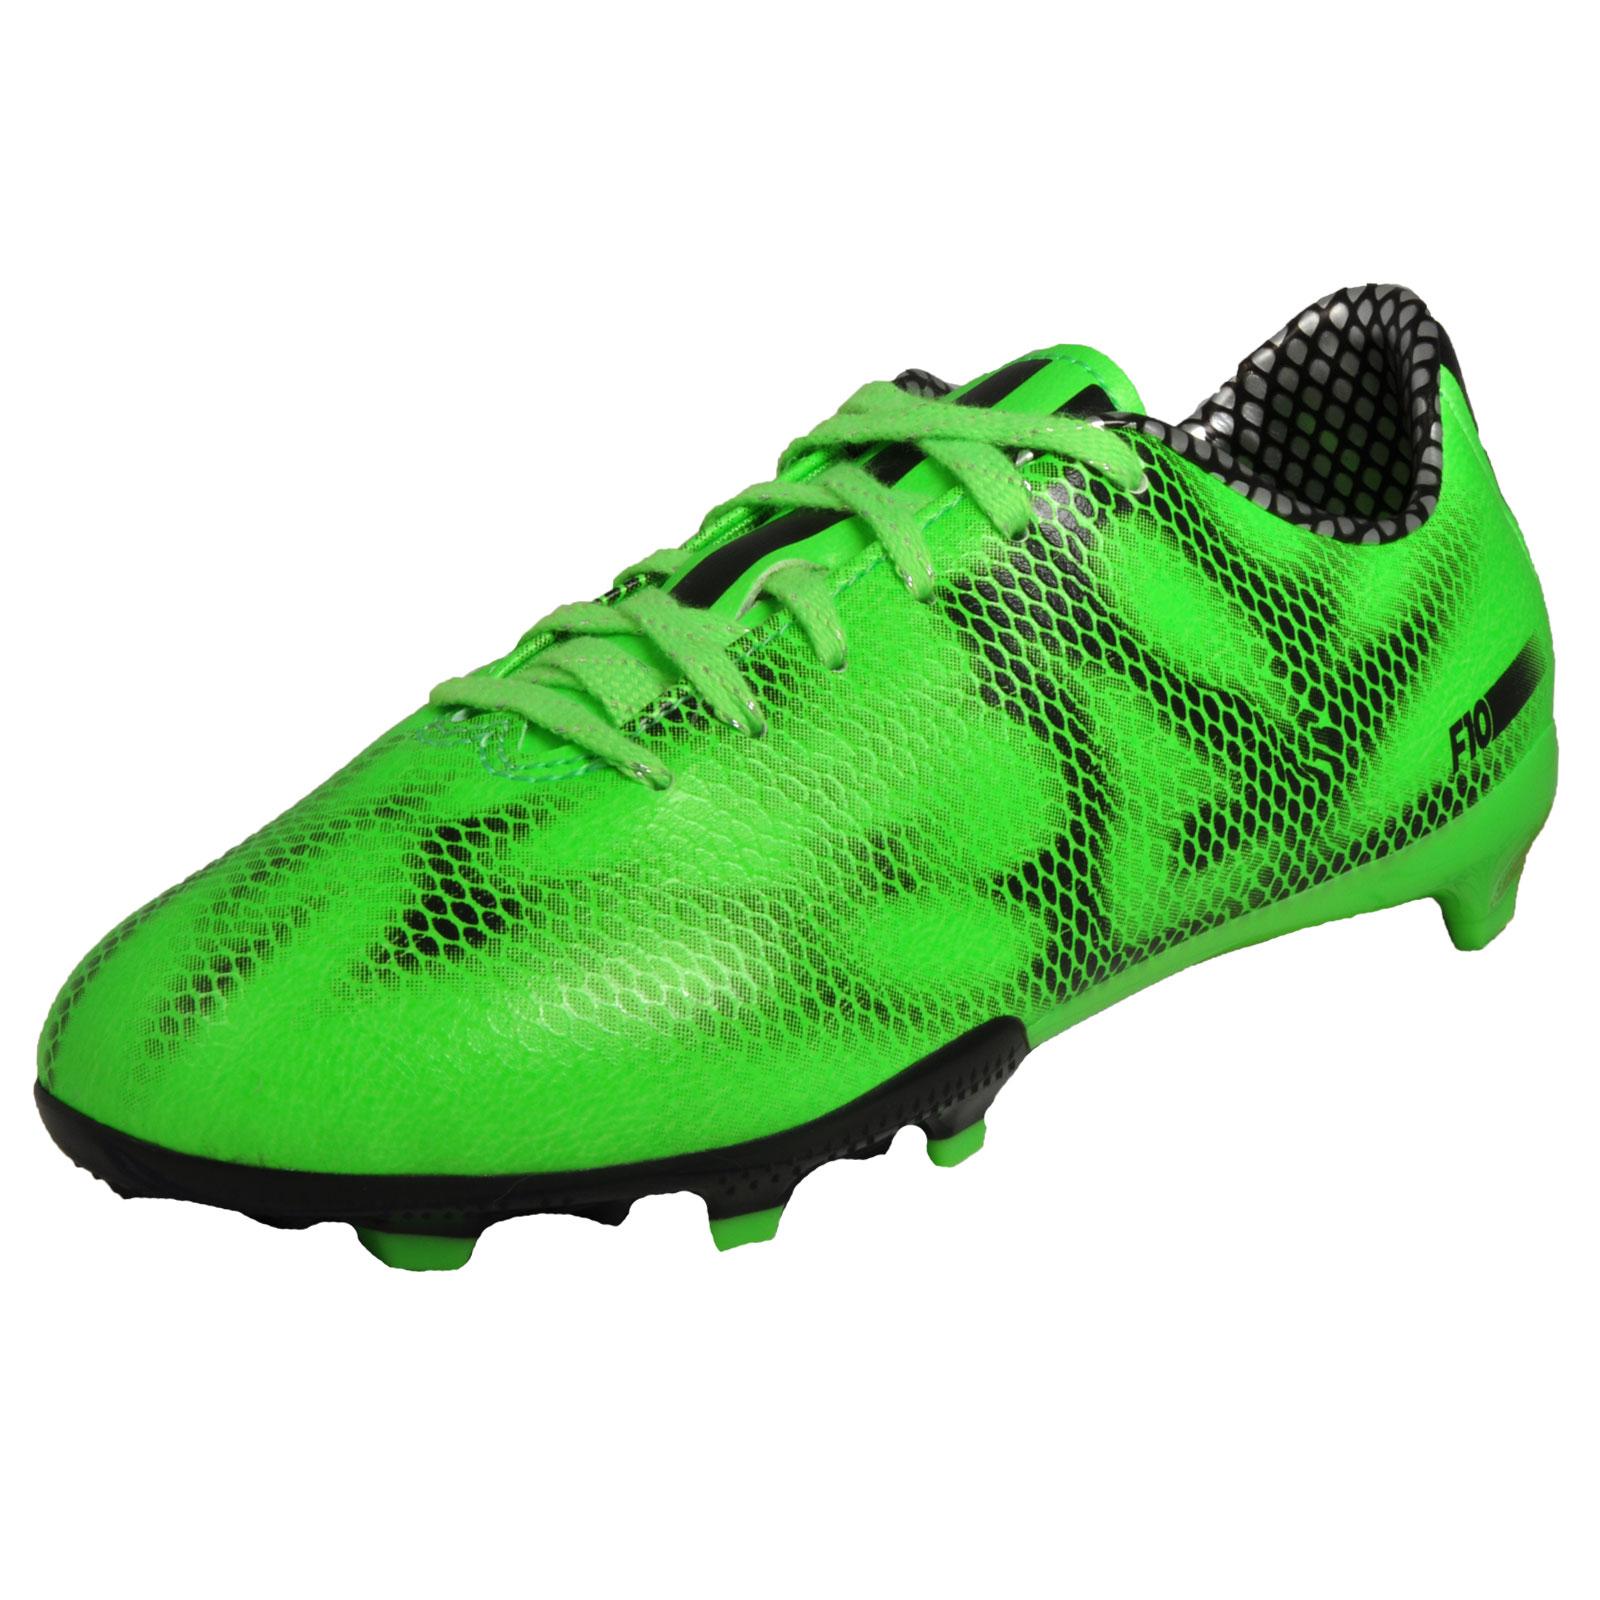 adidas f10 fg junior ragazzi ragazzi premier football stivali verde nero su ebay